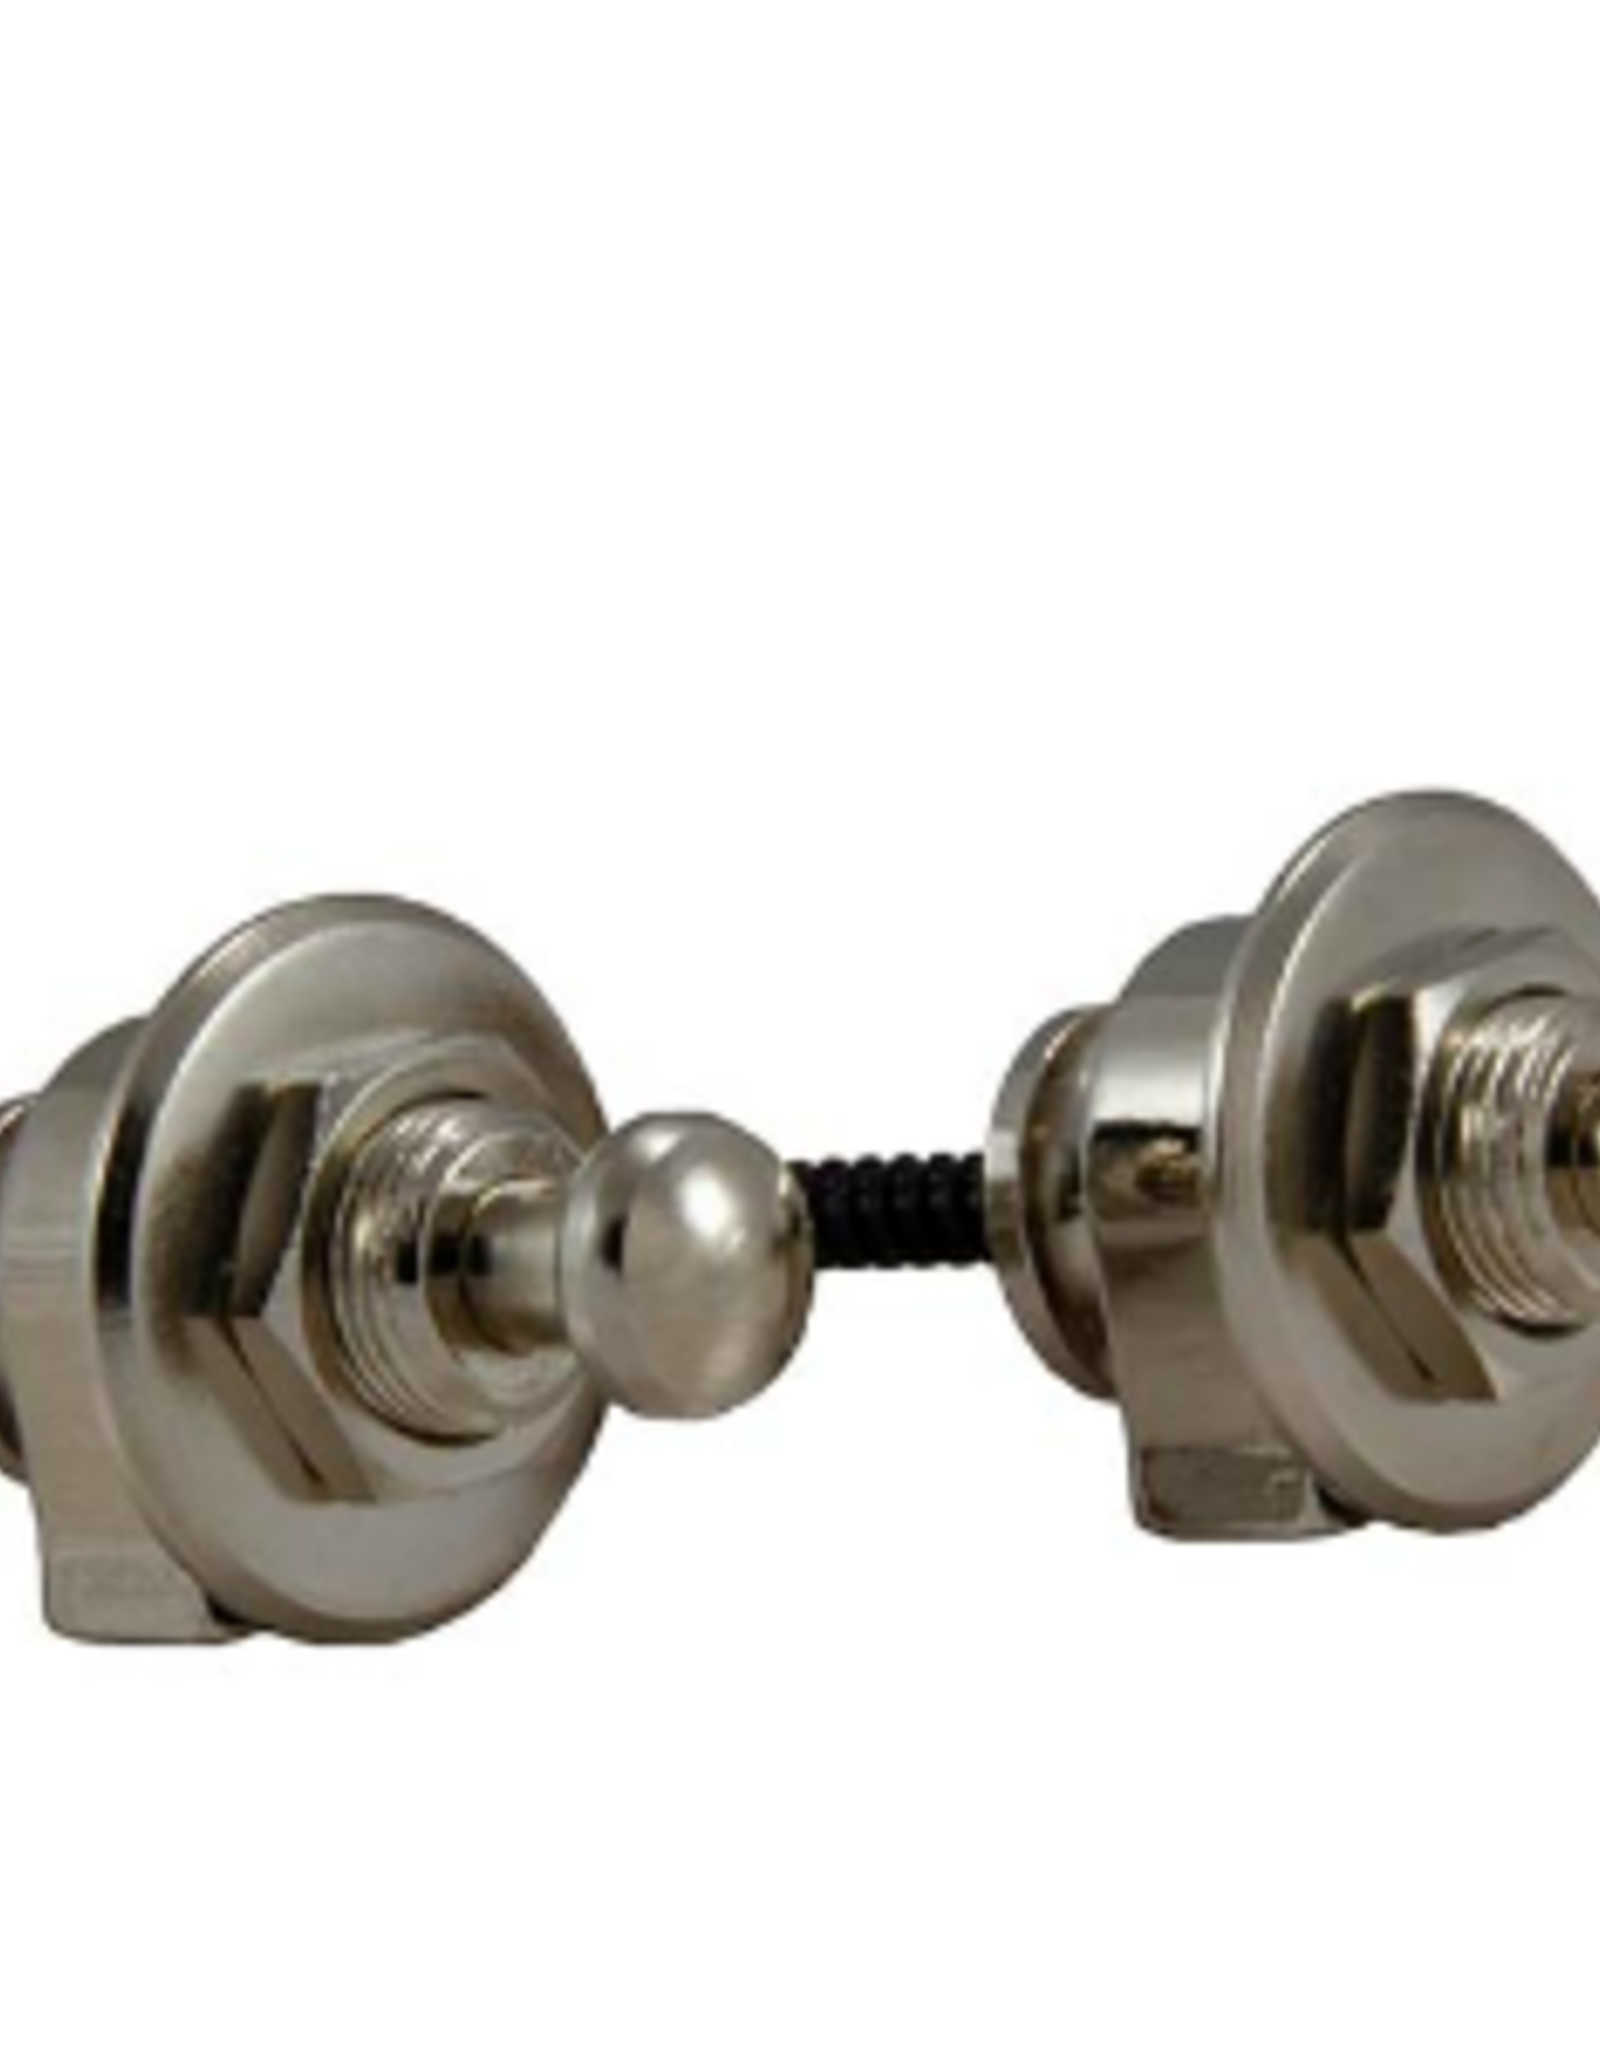 GROVER GROVER Straplocks & Endpins Nickel